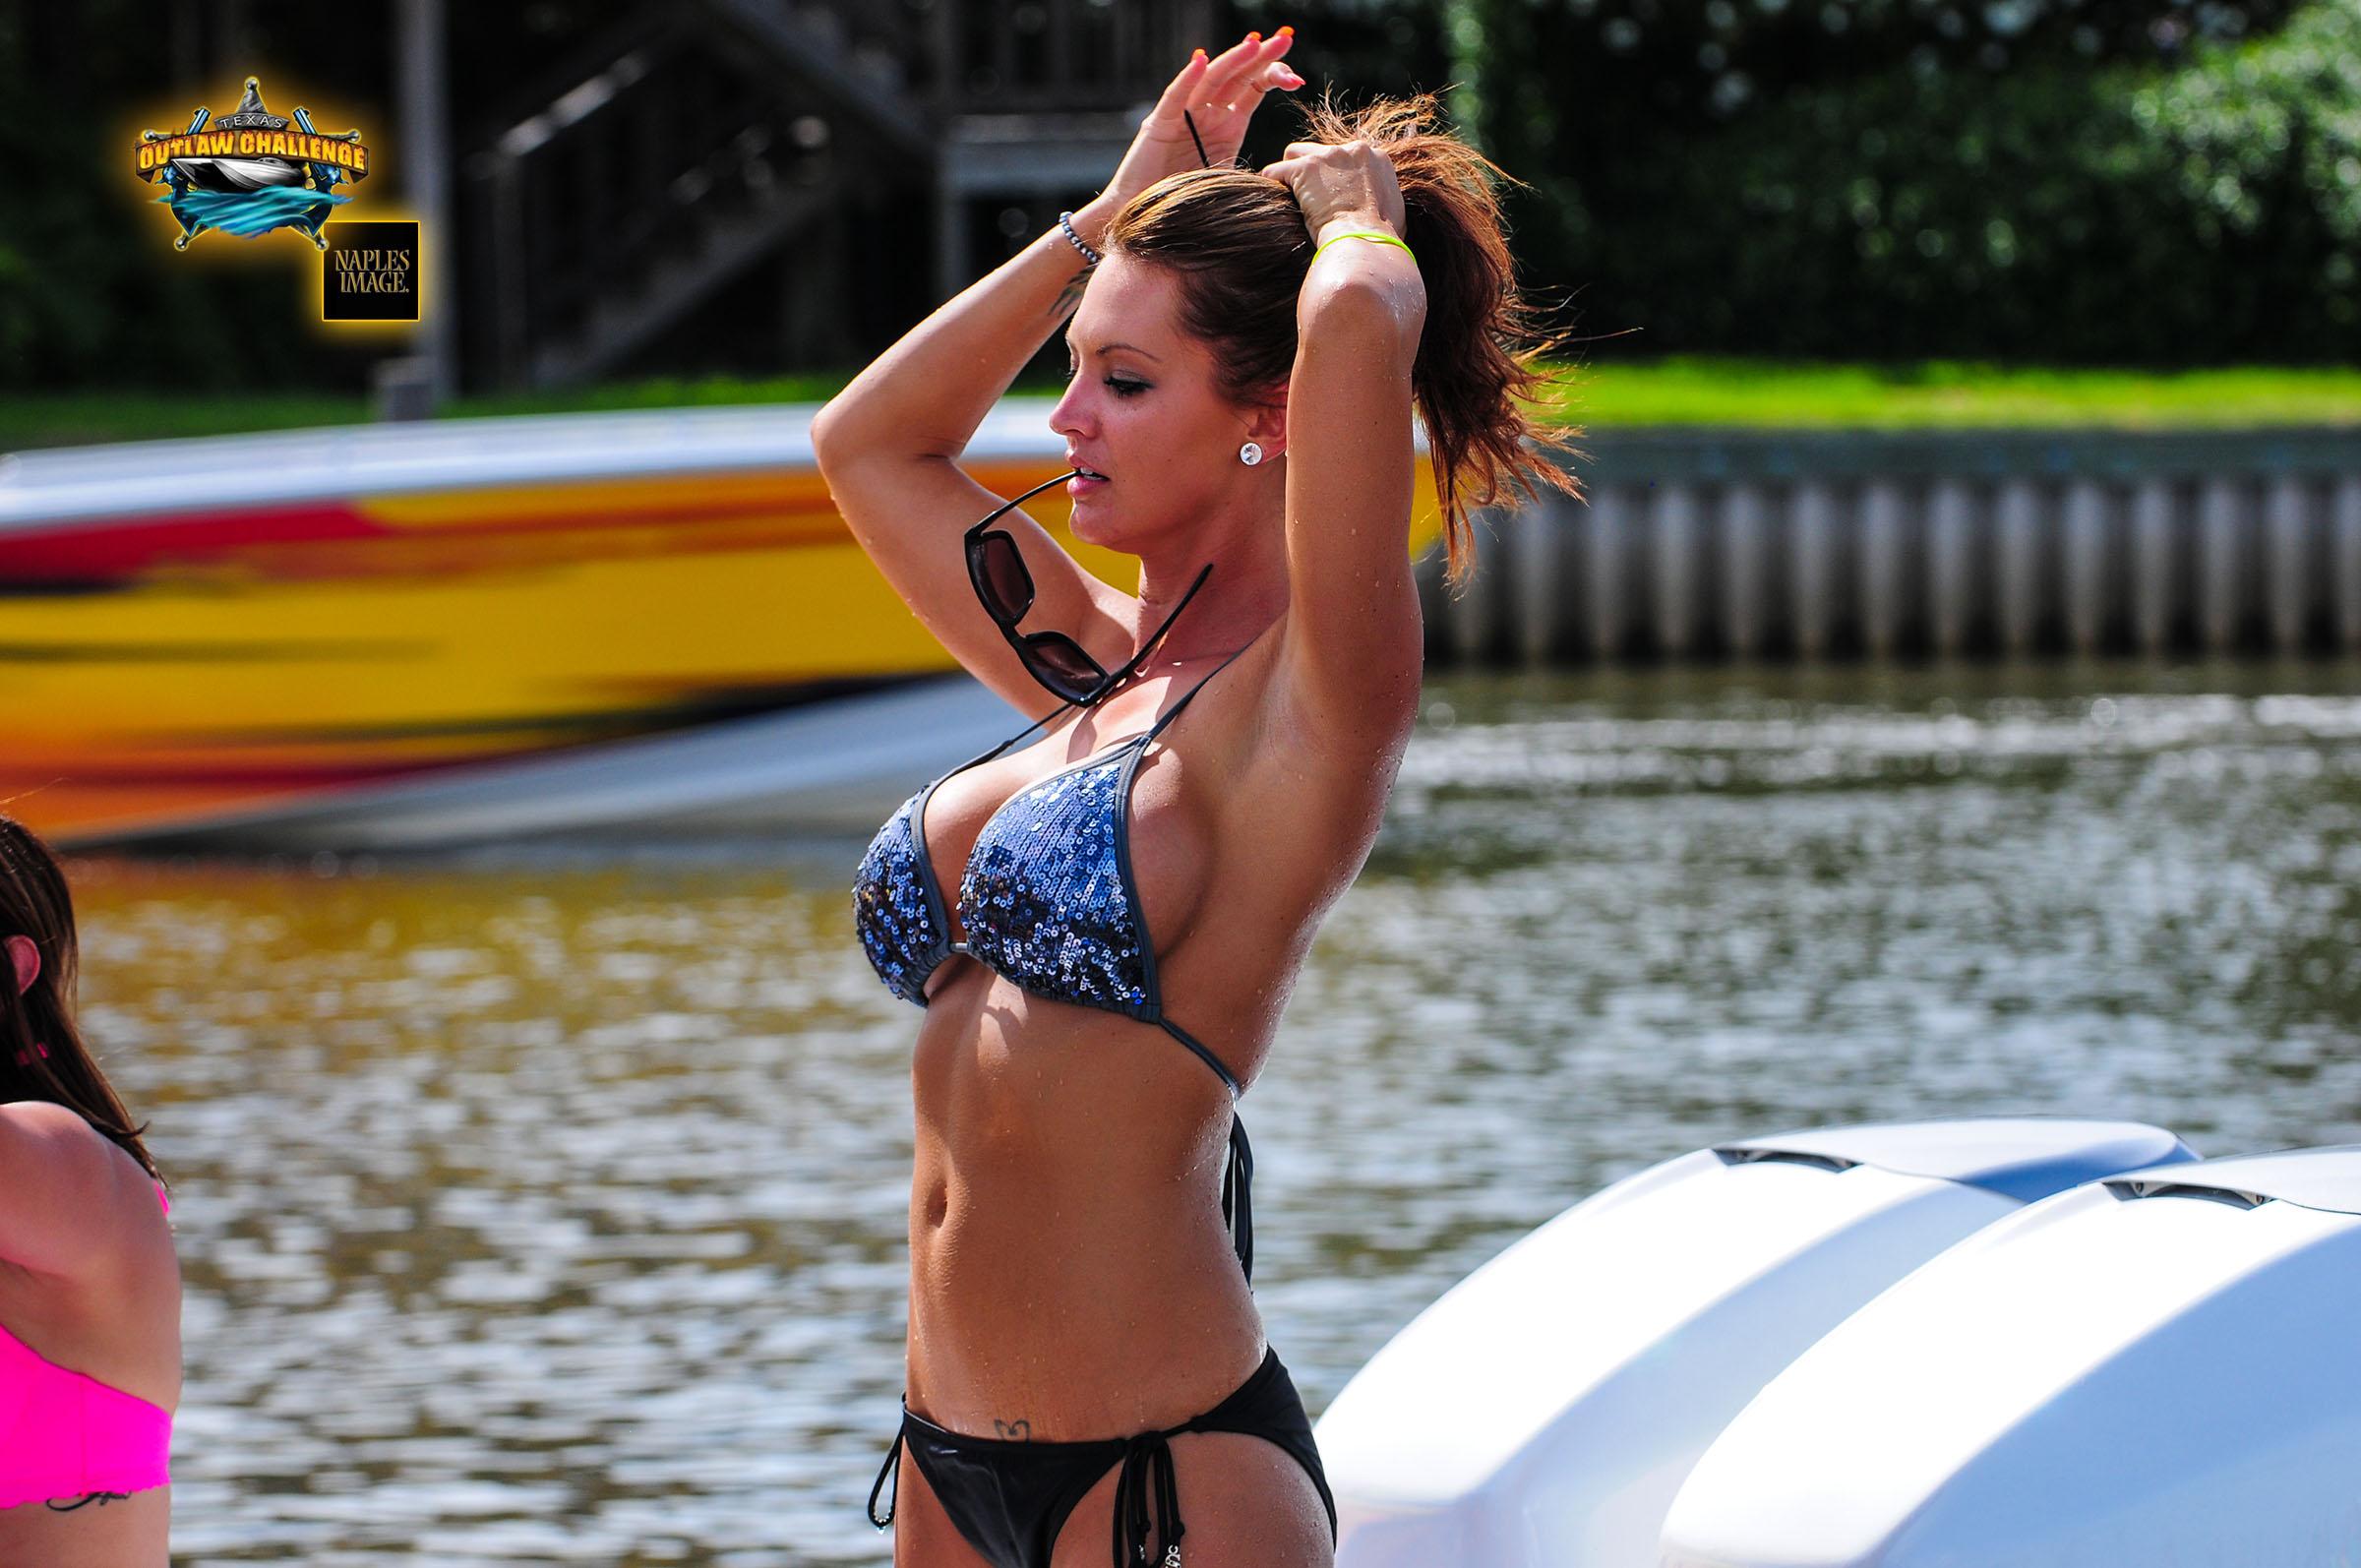 sexy-bikini-challenge-coming-soon-girl-videoss